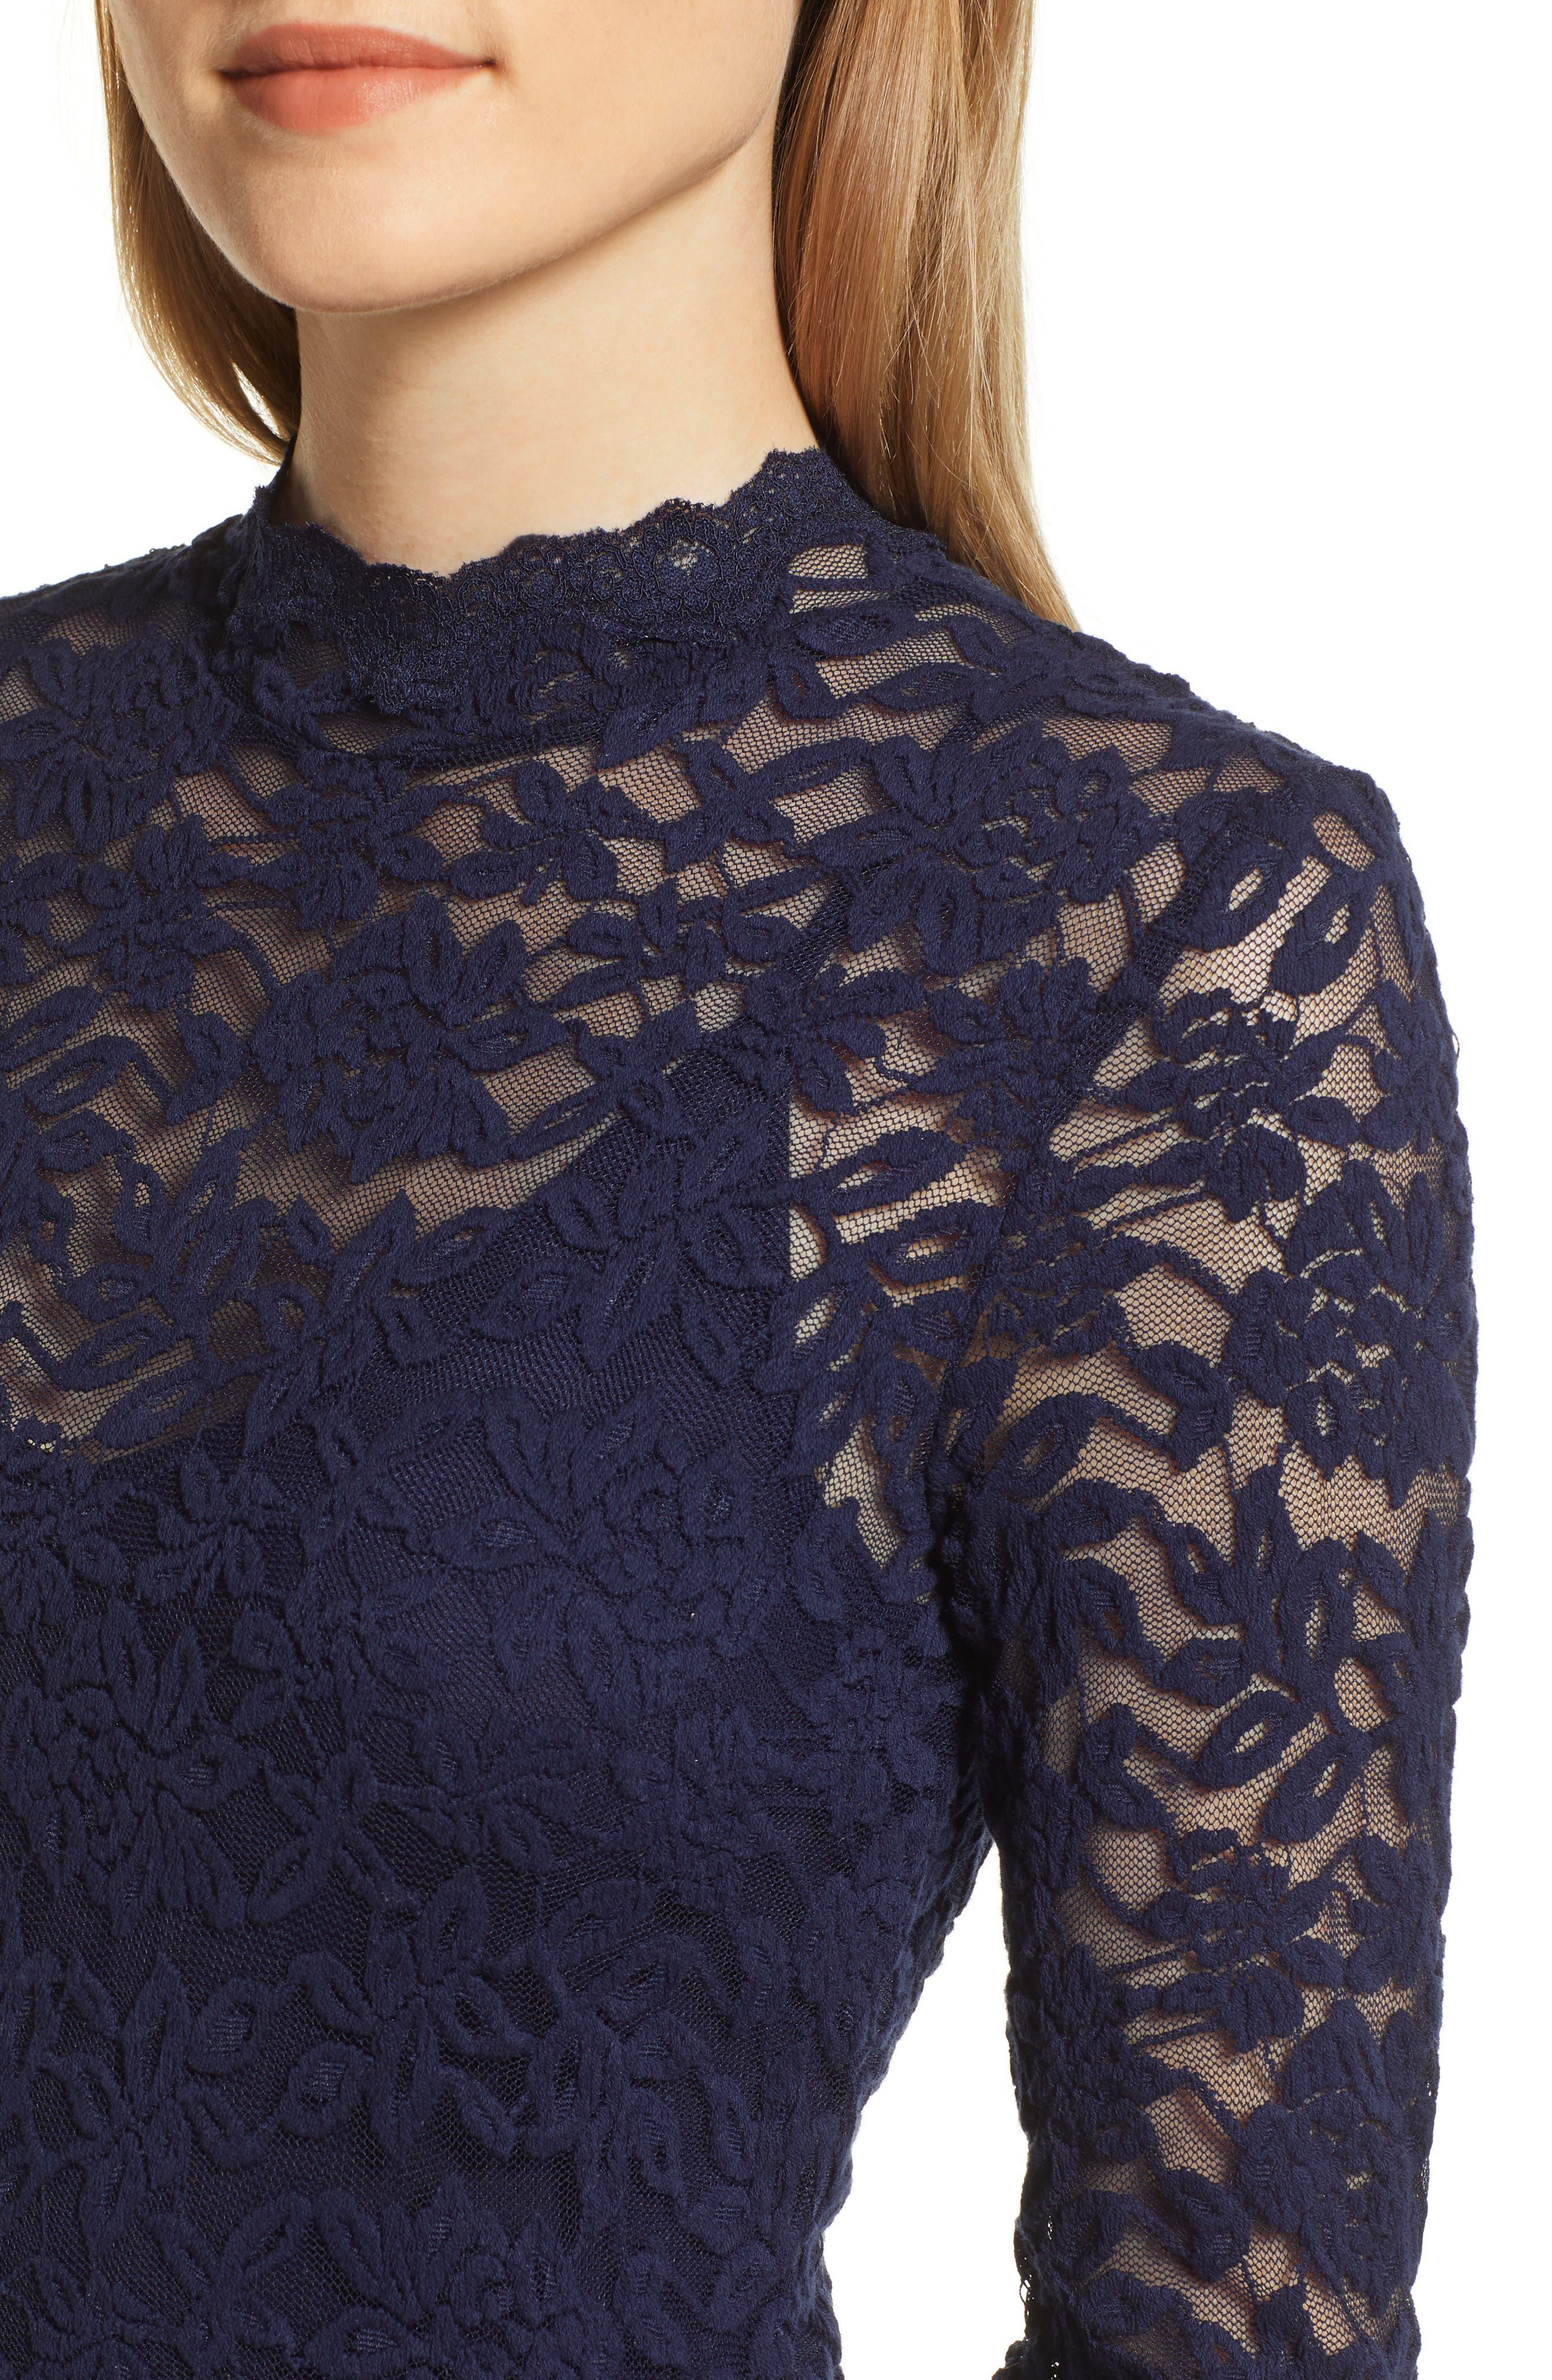 ROSEMUNDE, Delicia Lace Body-Con Dress, Alternate thumbnail 5, color, MARITIME BLUE